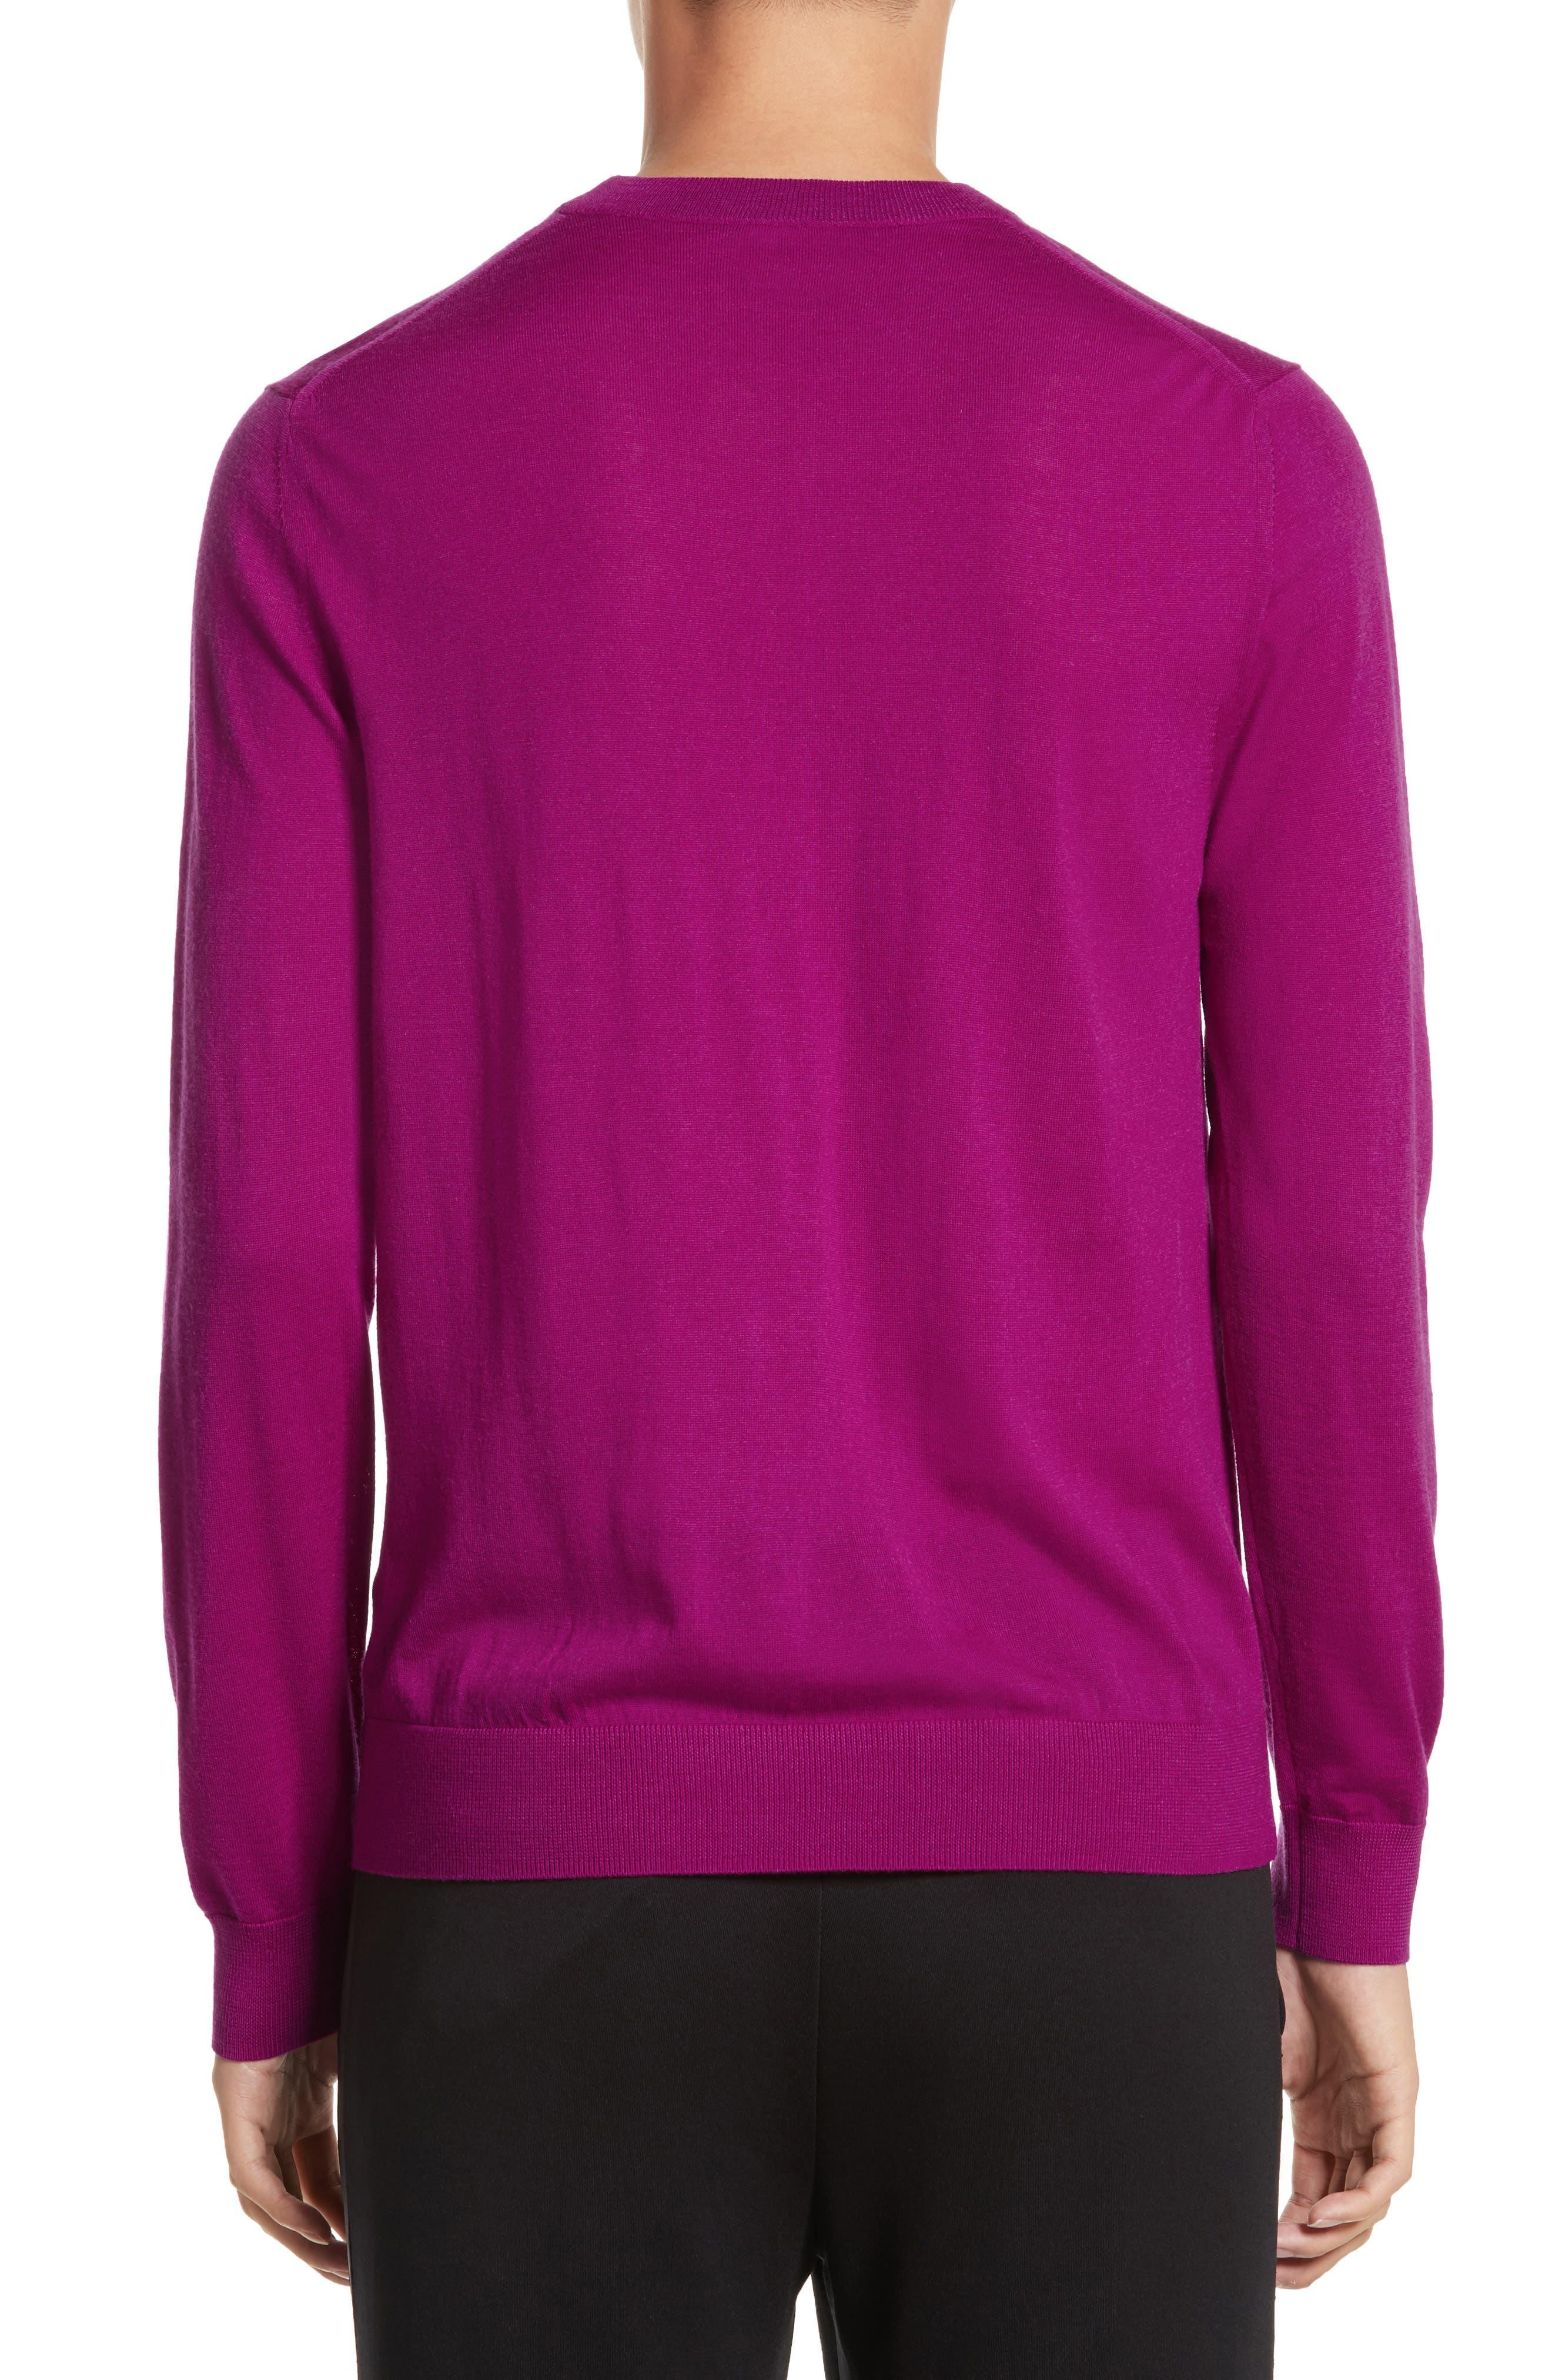 Alternate Image 2  - Paul Smith Merino Wool Crewneck Sweater